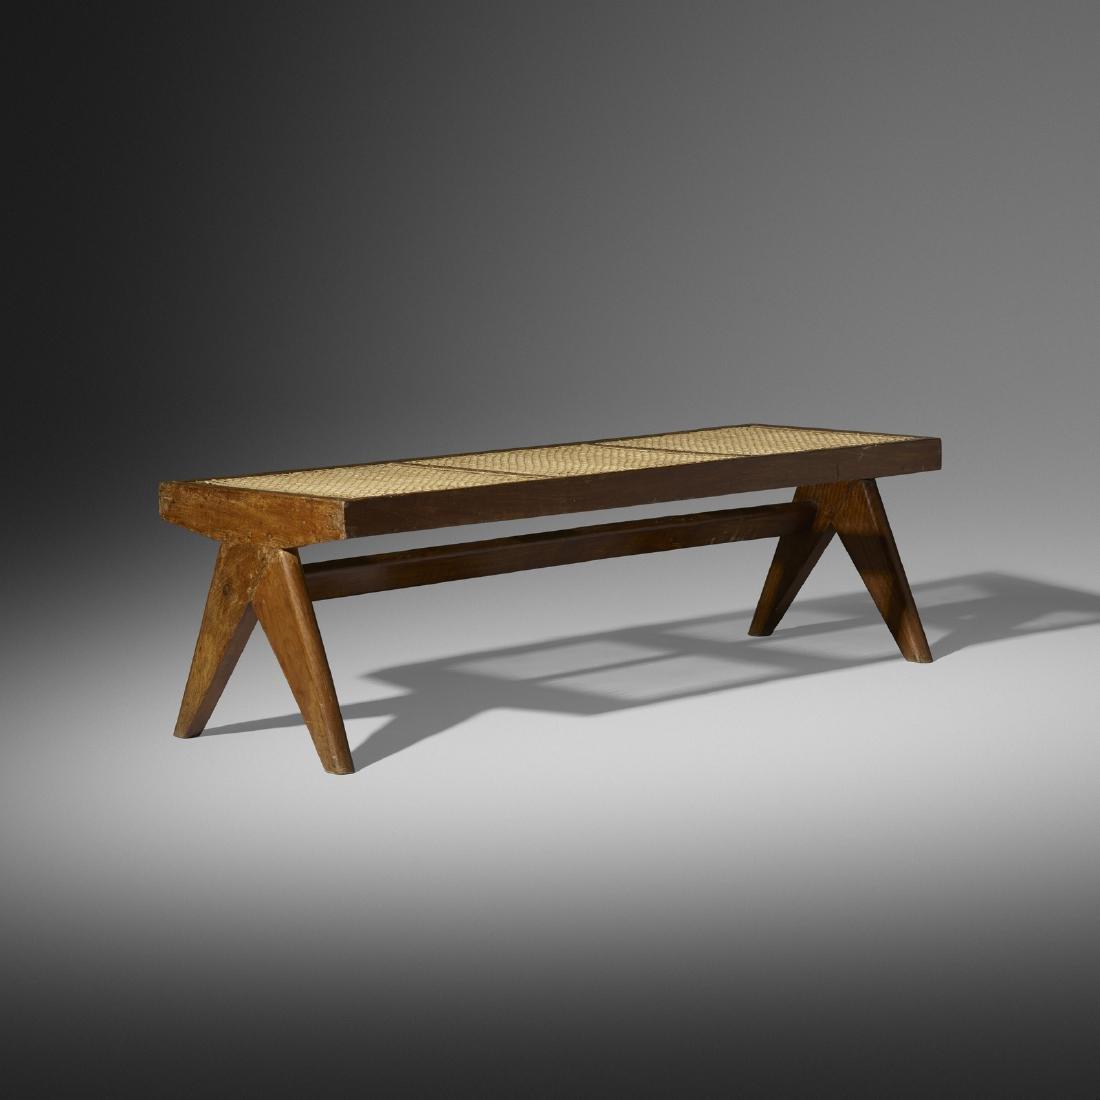 Pierre Jeanneret, bench from Chandigarh